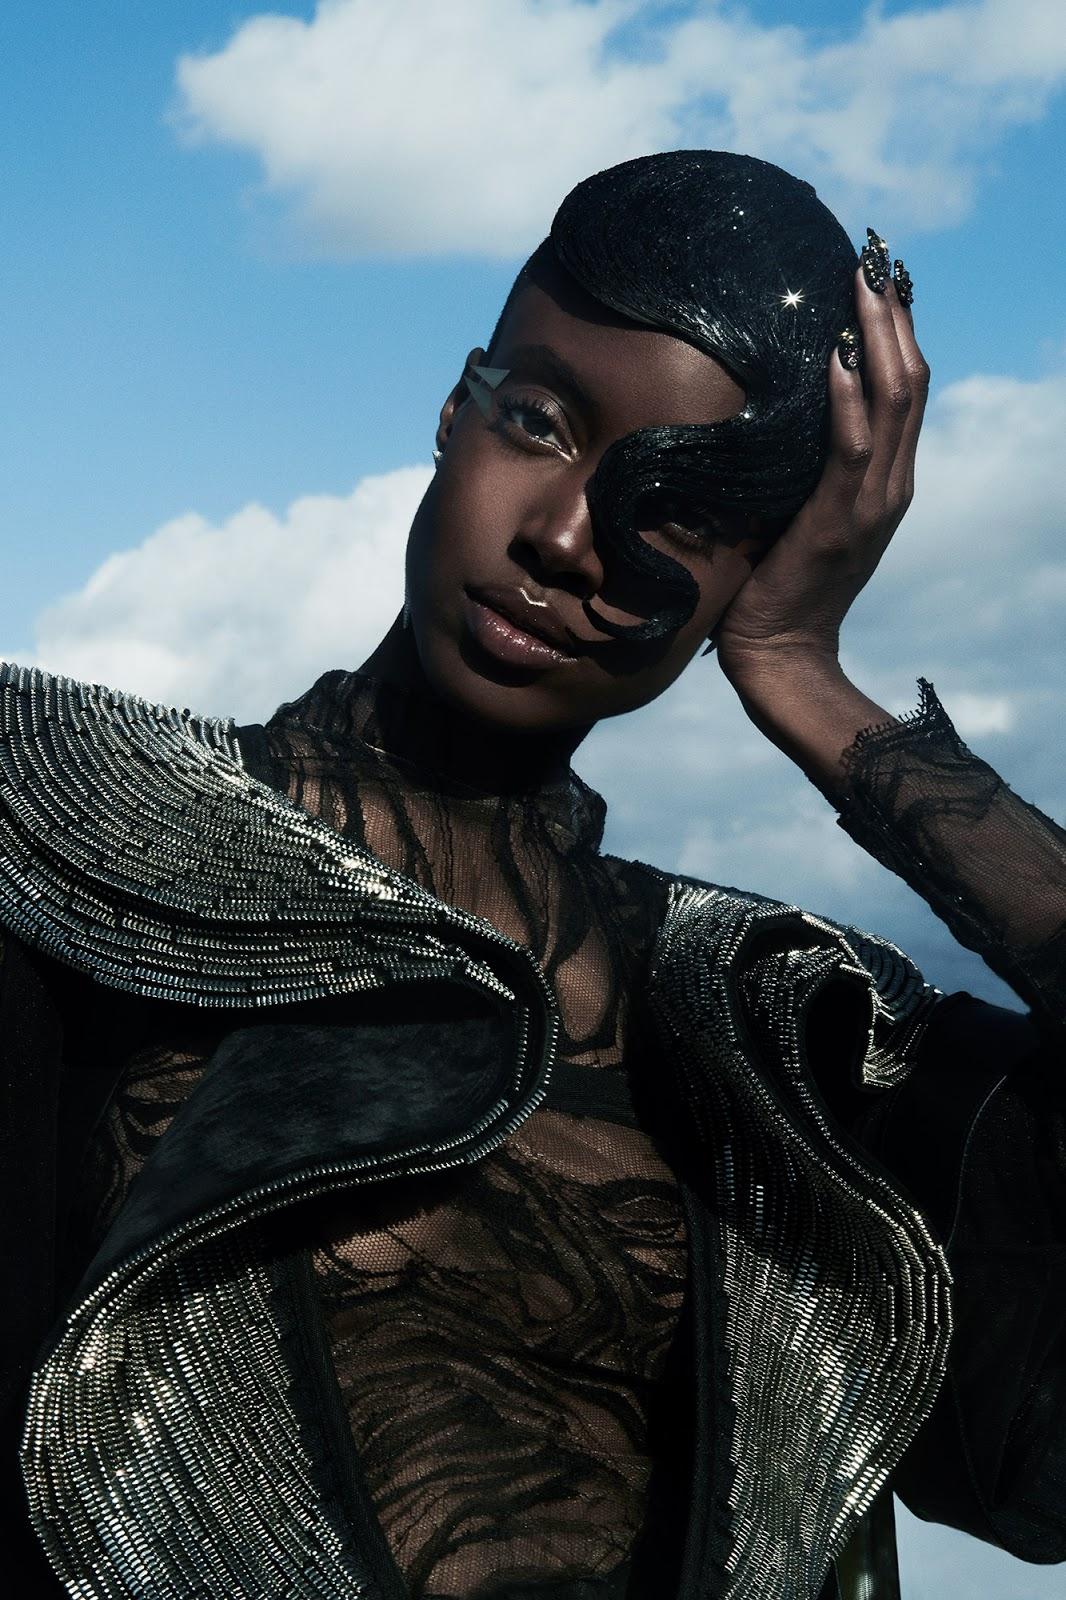 a99947ae5 Gold Metallic Graphic Makeup, Gold Bath Bomb, Glitter Bath- Beauty Fashion  Editorial with model Madisin Rian Bradley